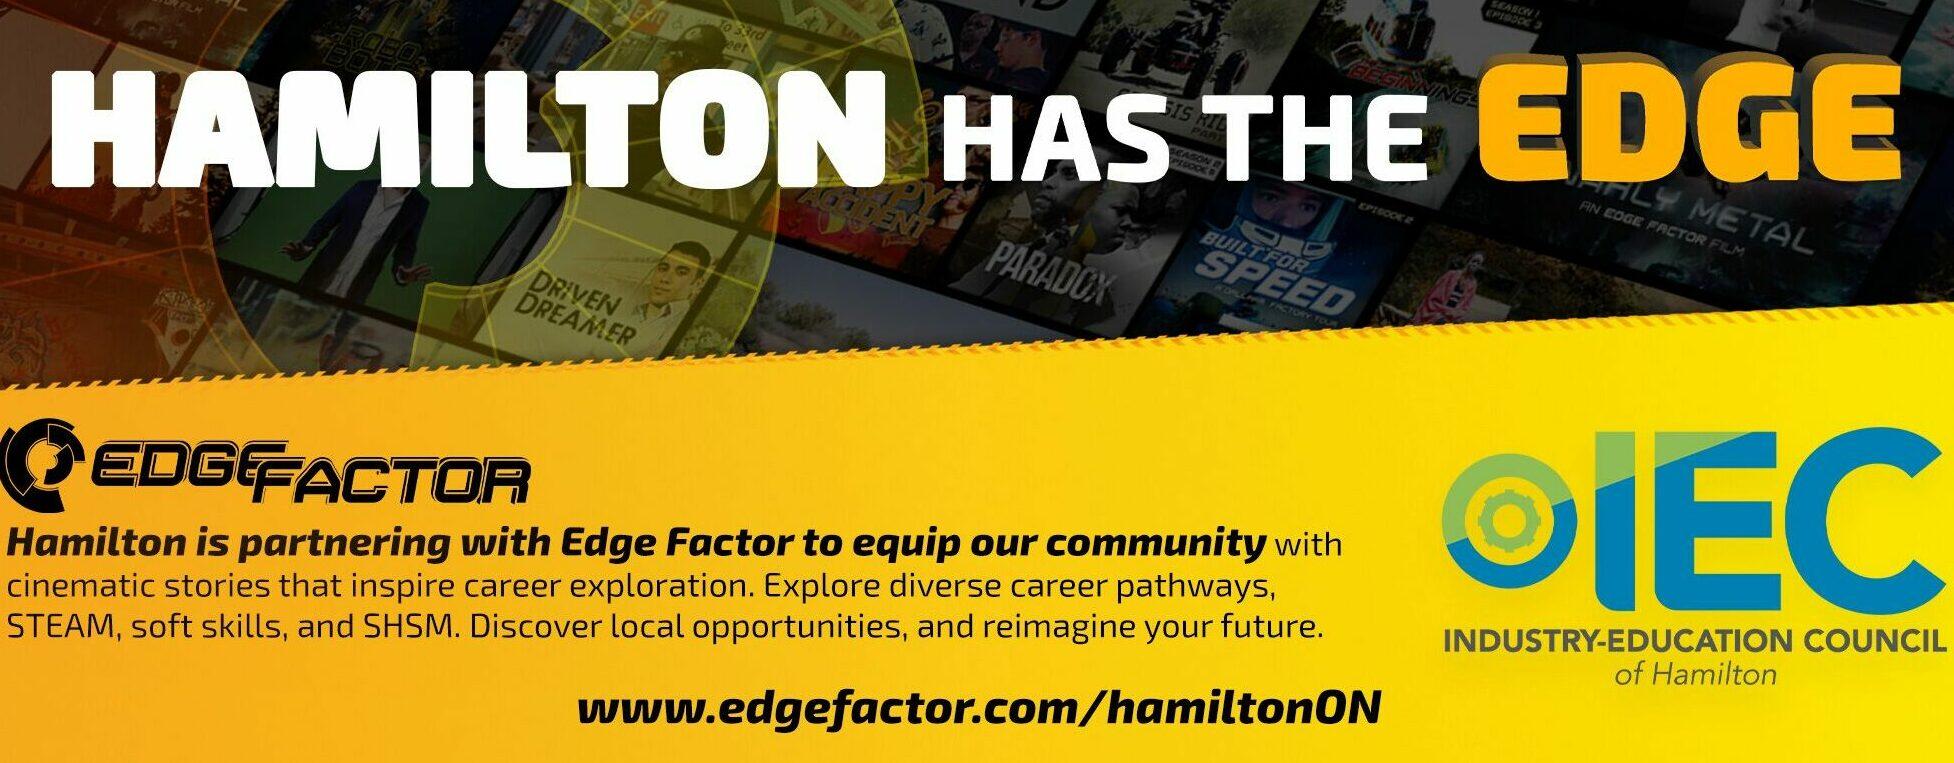 Hamilton and Edge Factor partner to tackle Workforce Development